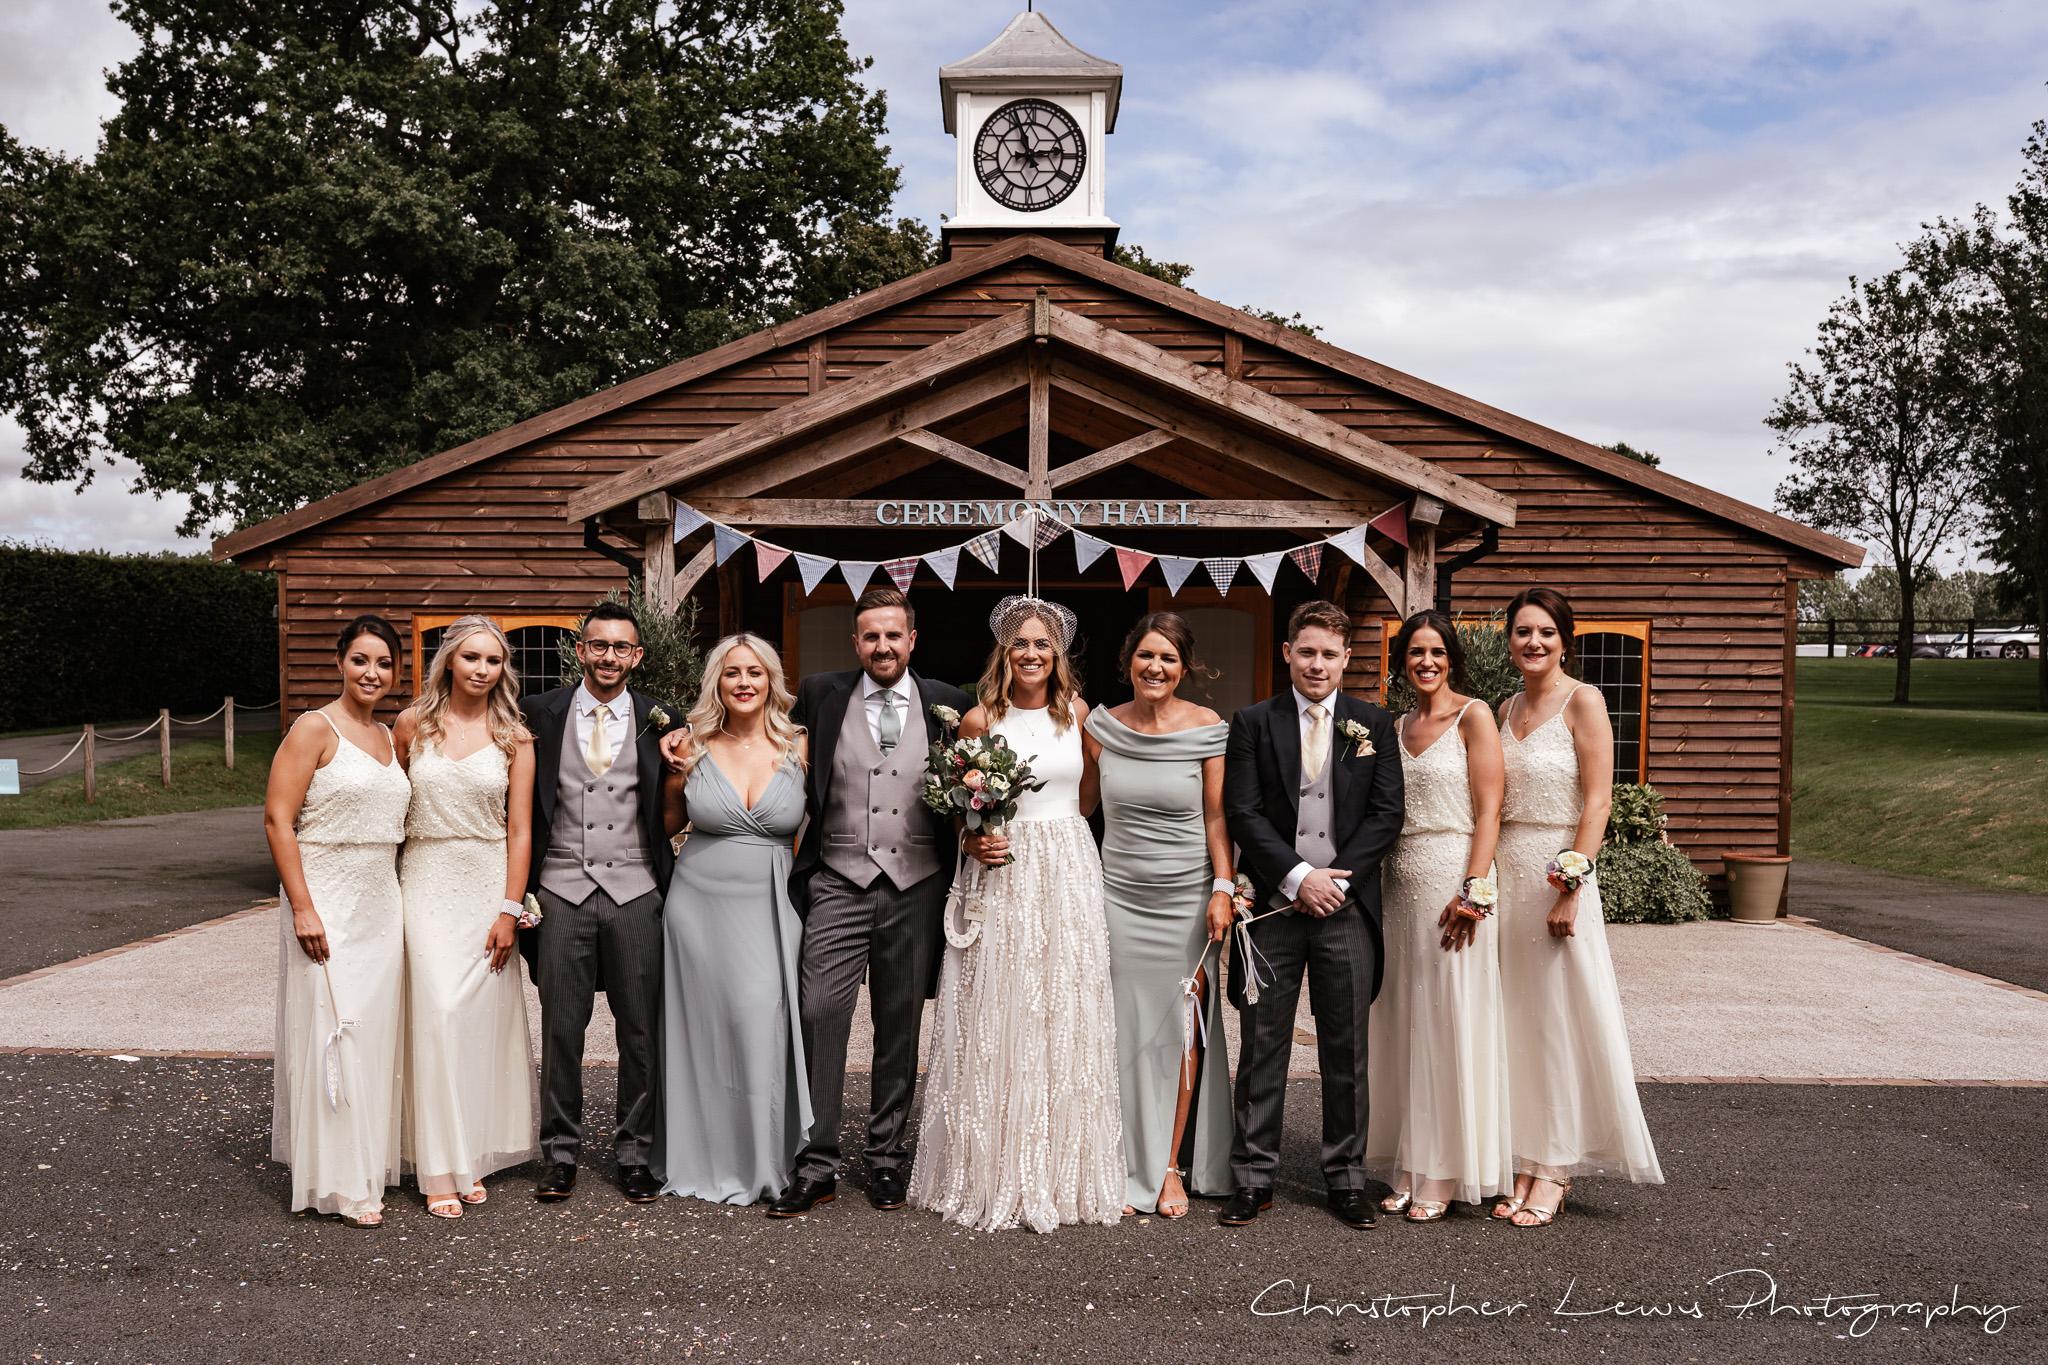 Colshaw Hall Wedding bridal party